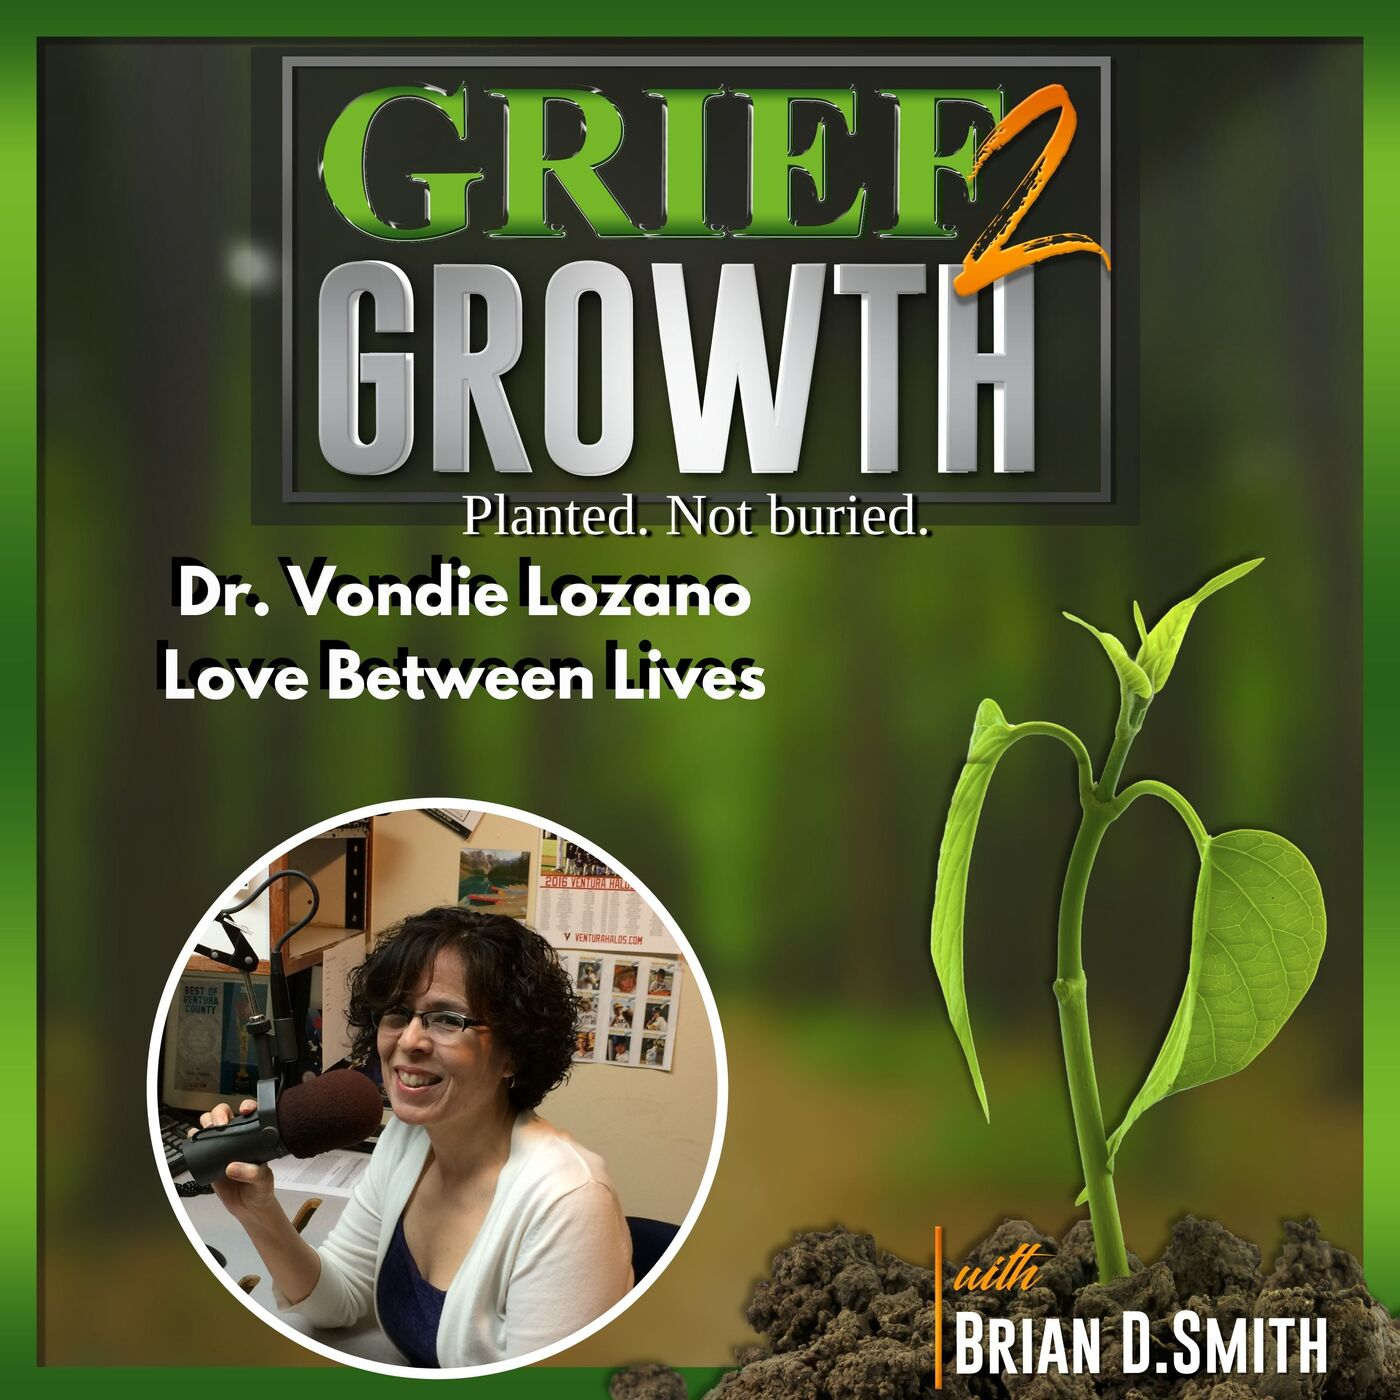 Dr. Vondie Lozano-Life Between Lives